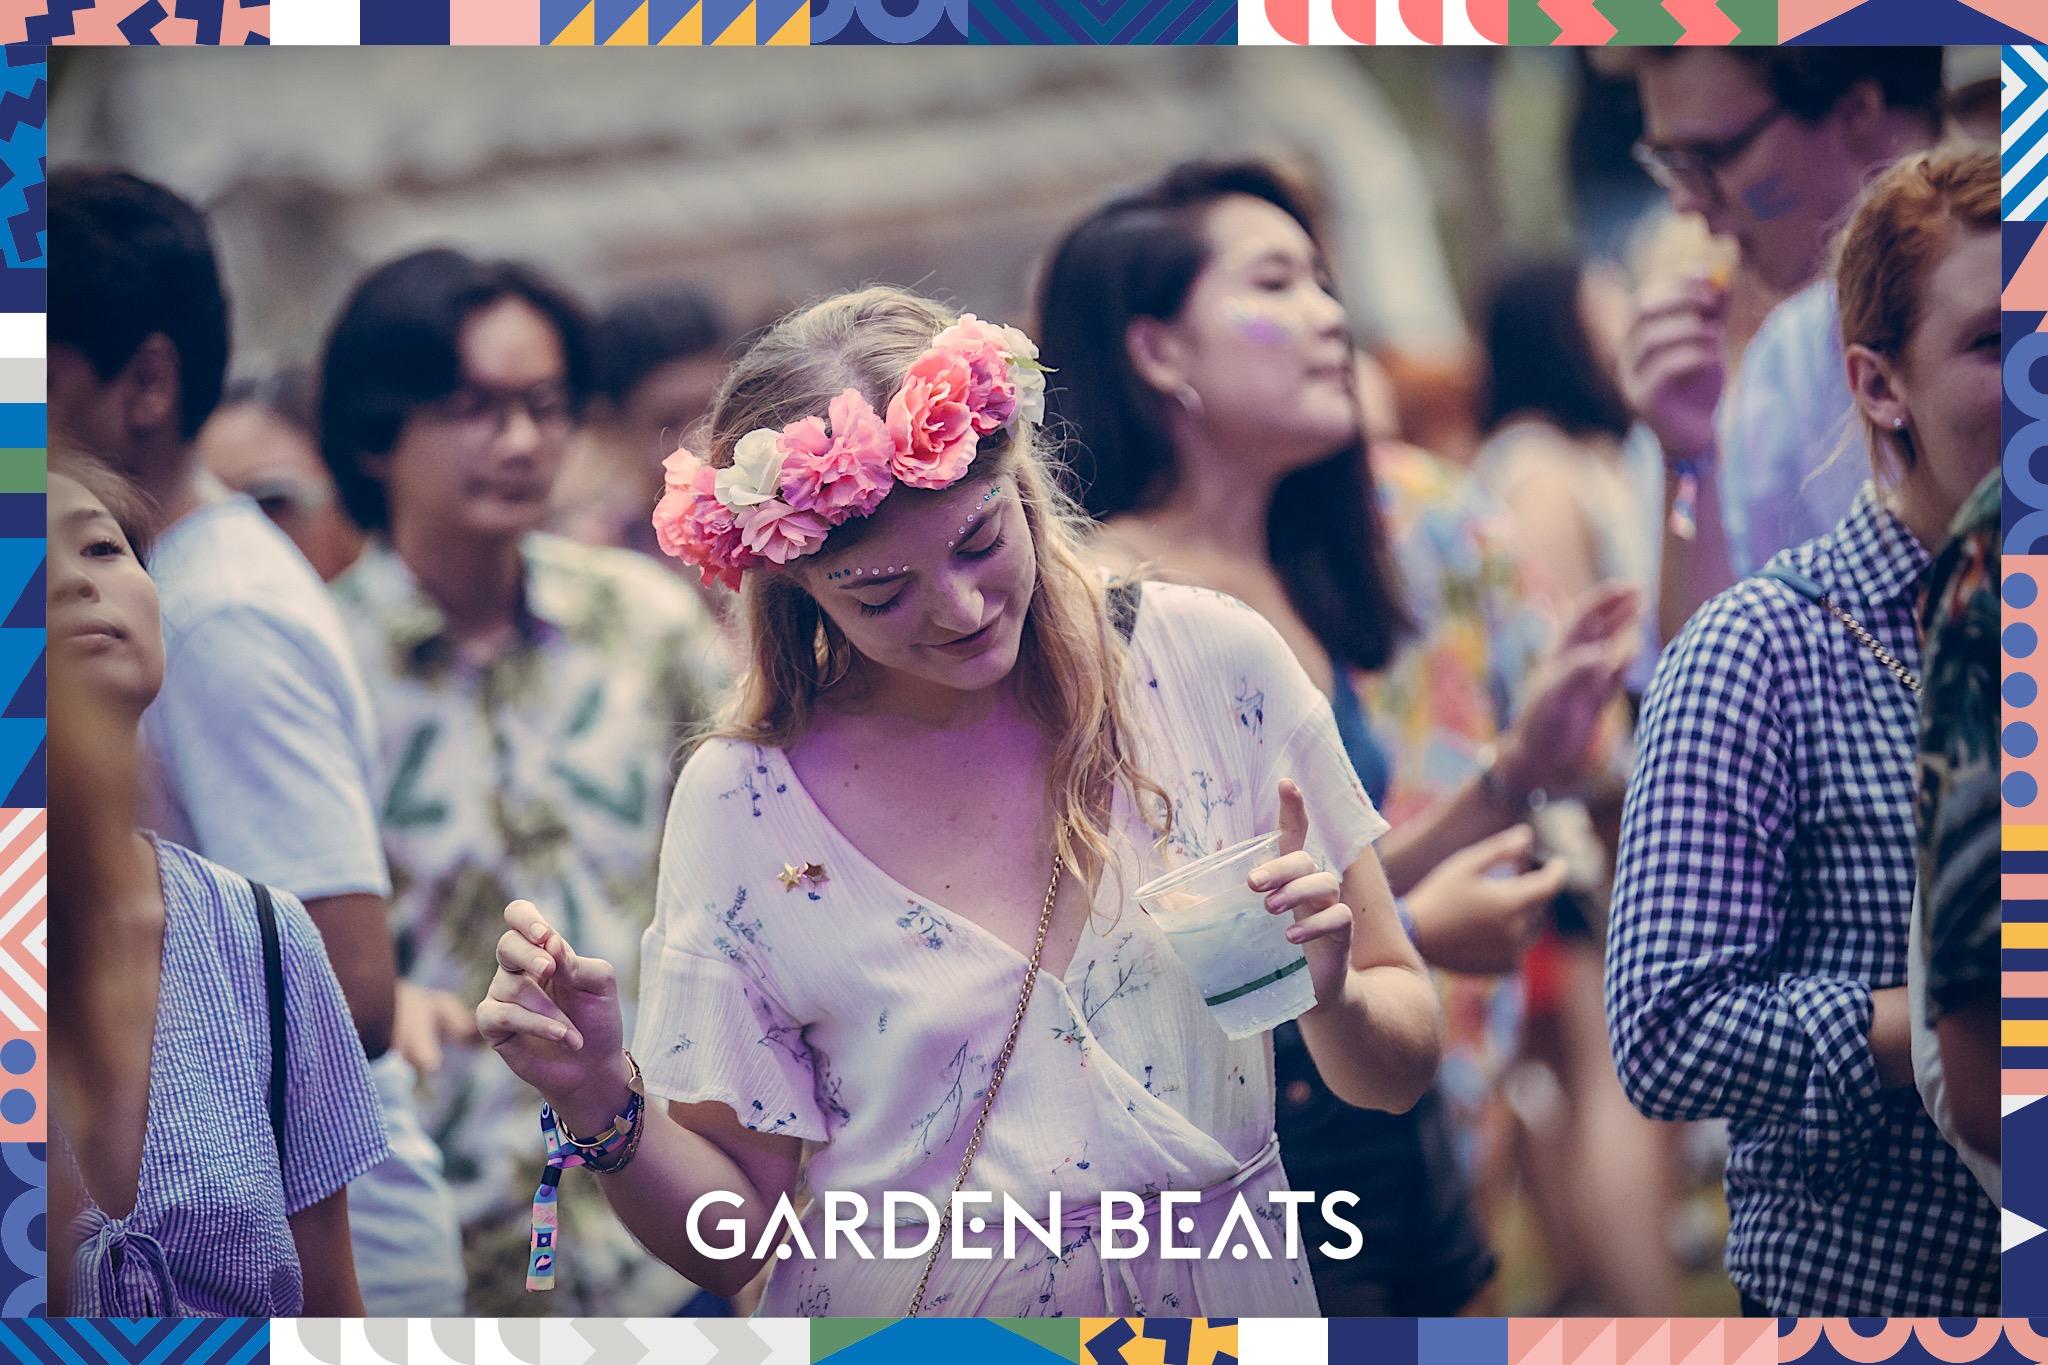 03032018_GardenBeats_Colossal582_Watermarked.jpg